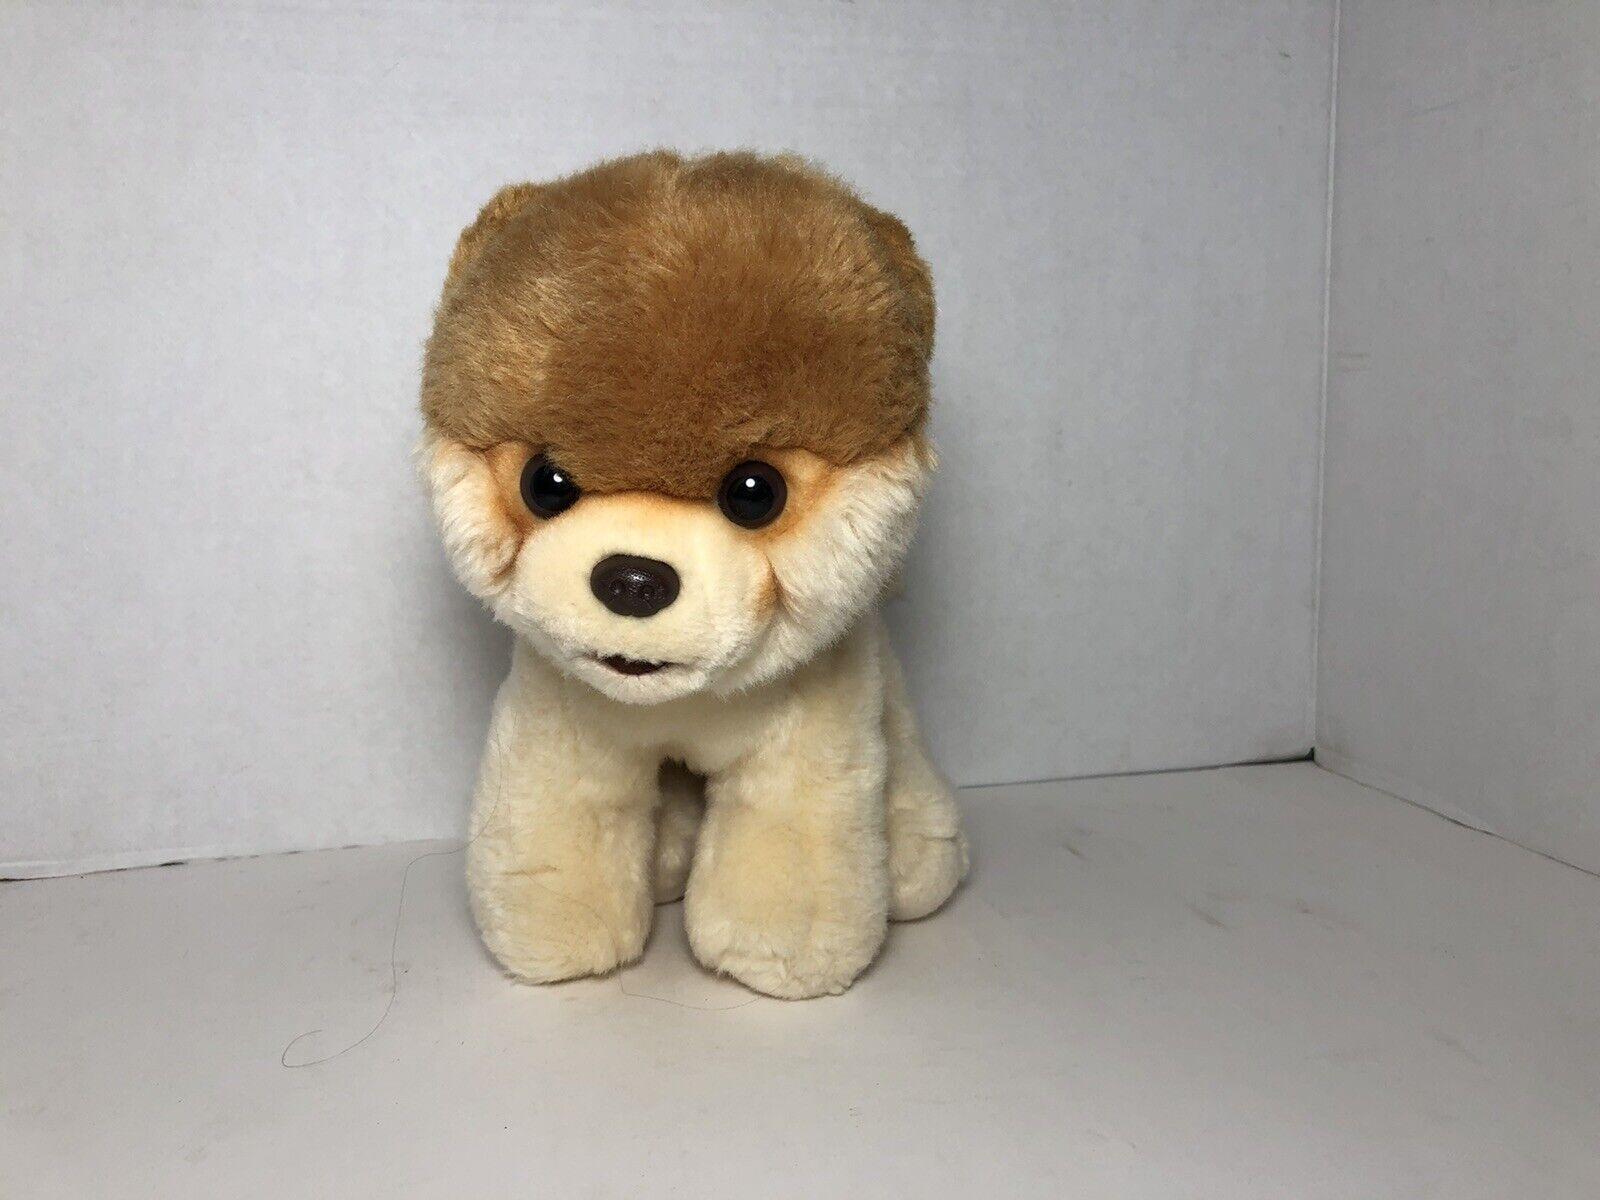 Cutest Dog Ever Boo Wall Calendar 2017 Fluffy Head Adorable Puppy Design For Sale Online Ebay